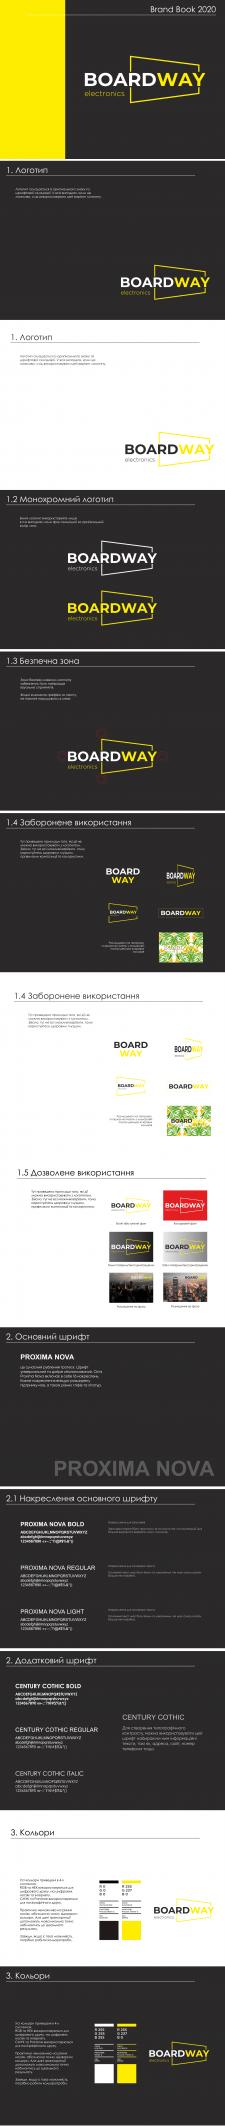 Board Way